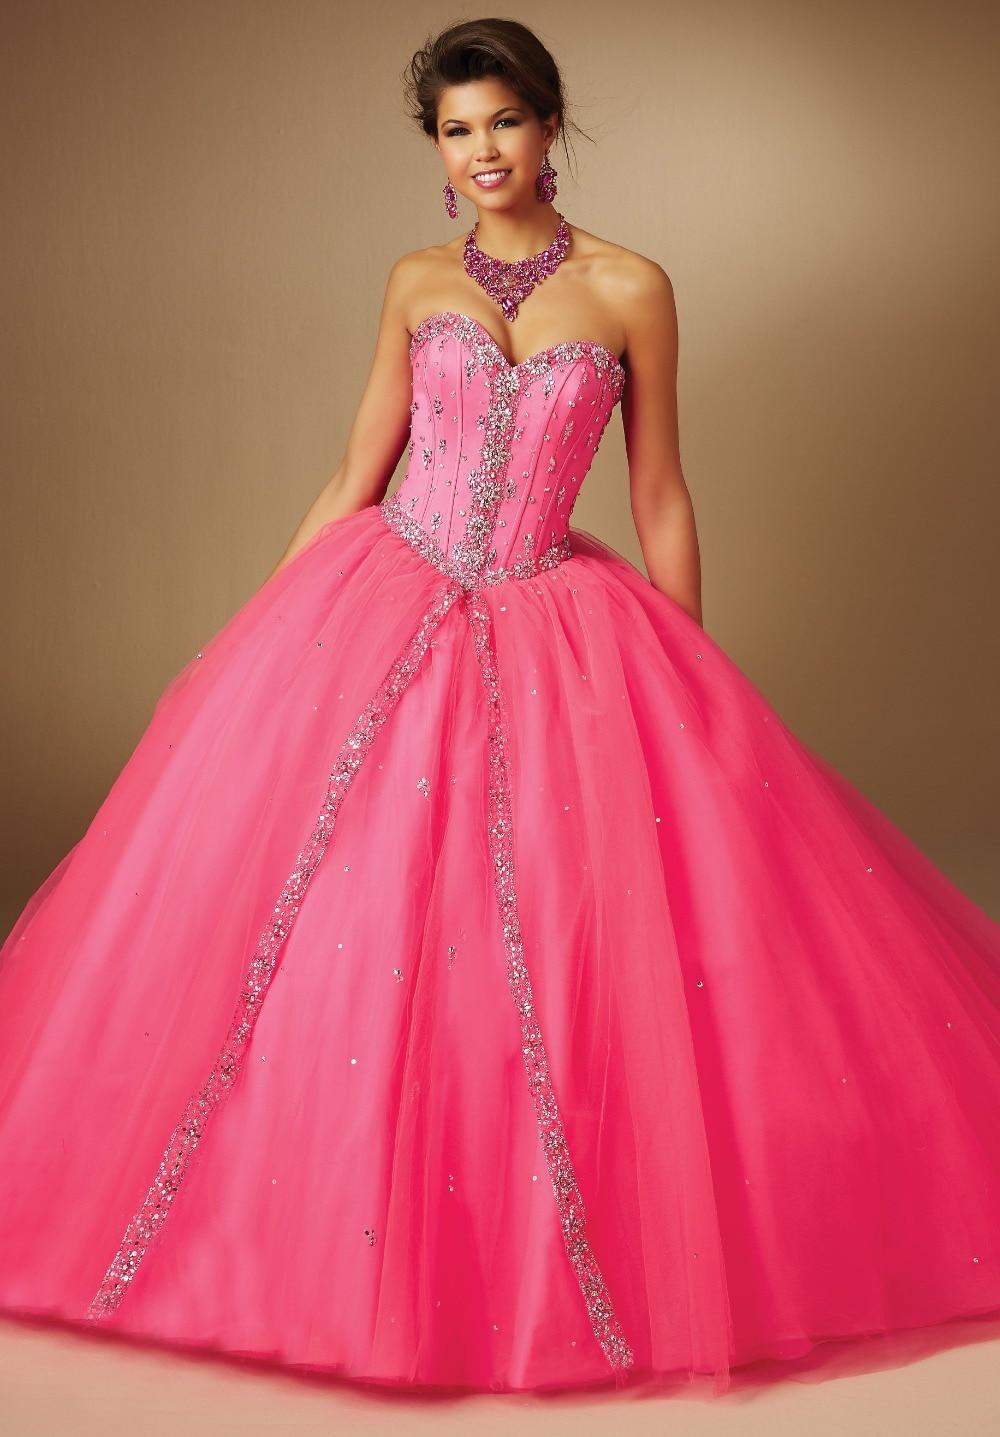 Strapless Long Formal Dresses Poofy